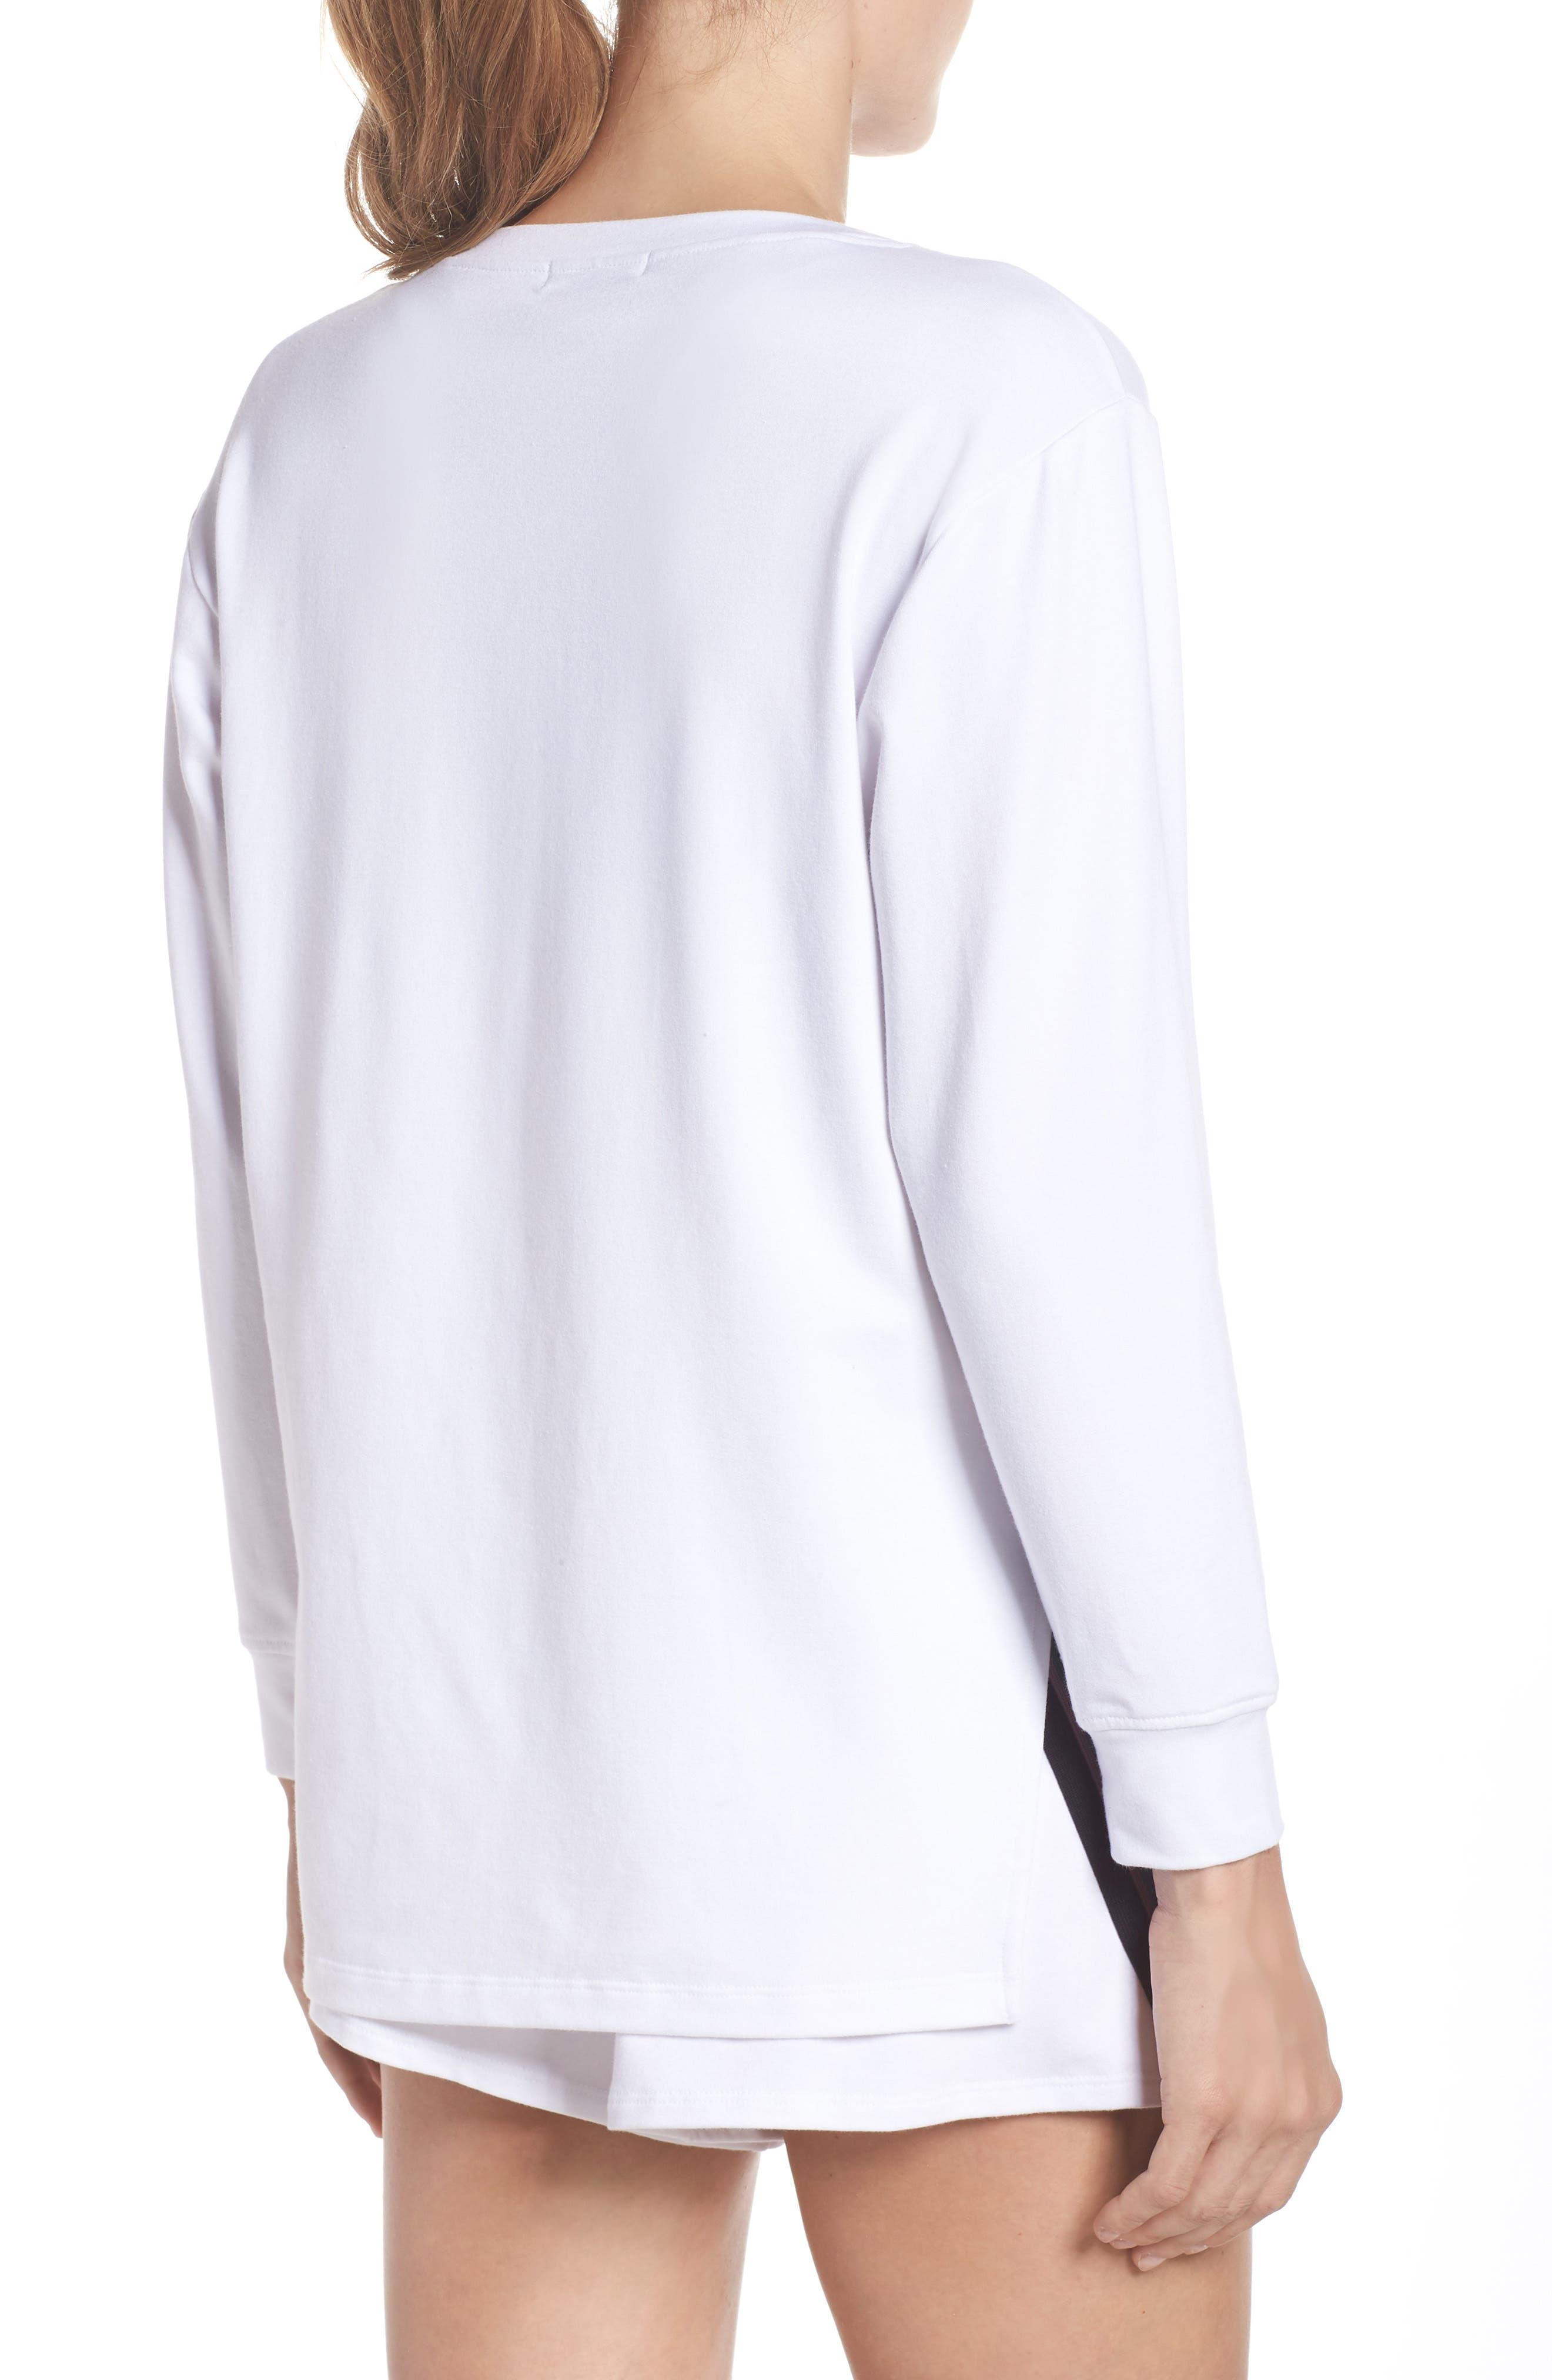 Bristol Pullover,                             Alternate thumbnail 2, color,                             WHITE/ BLACK